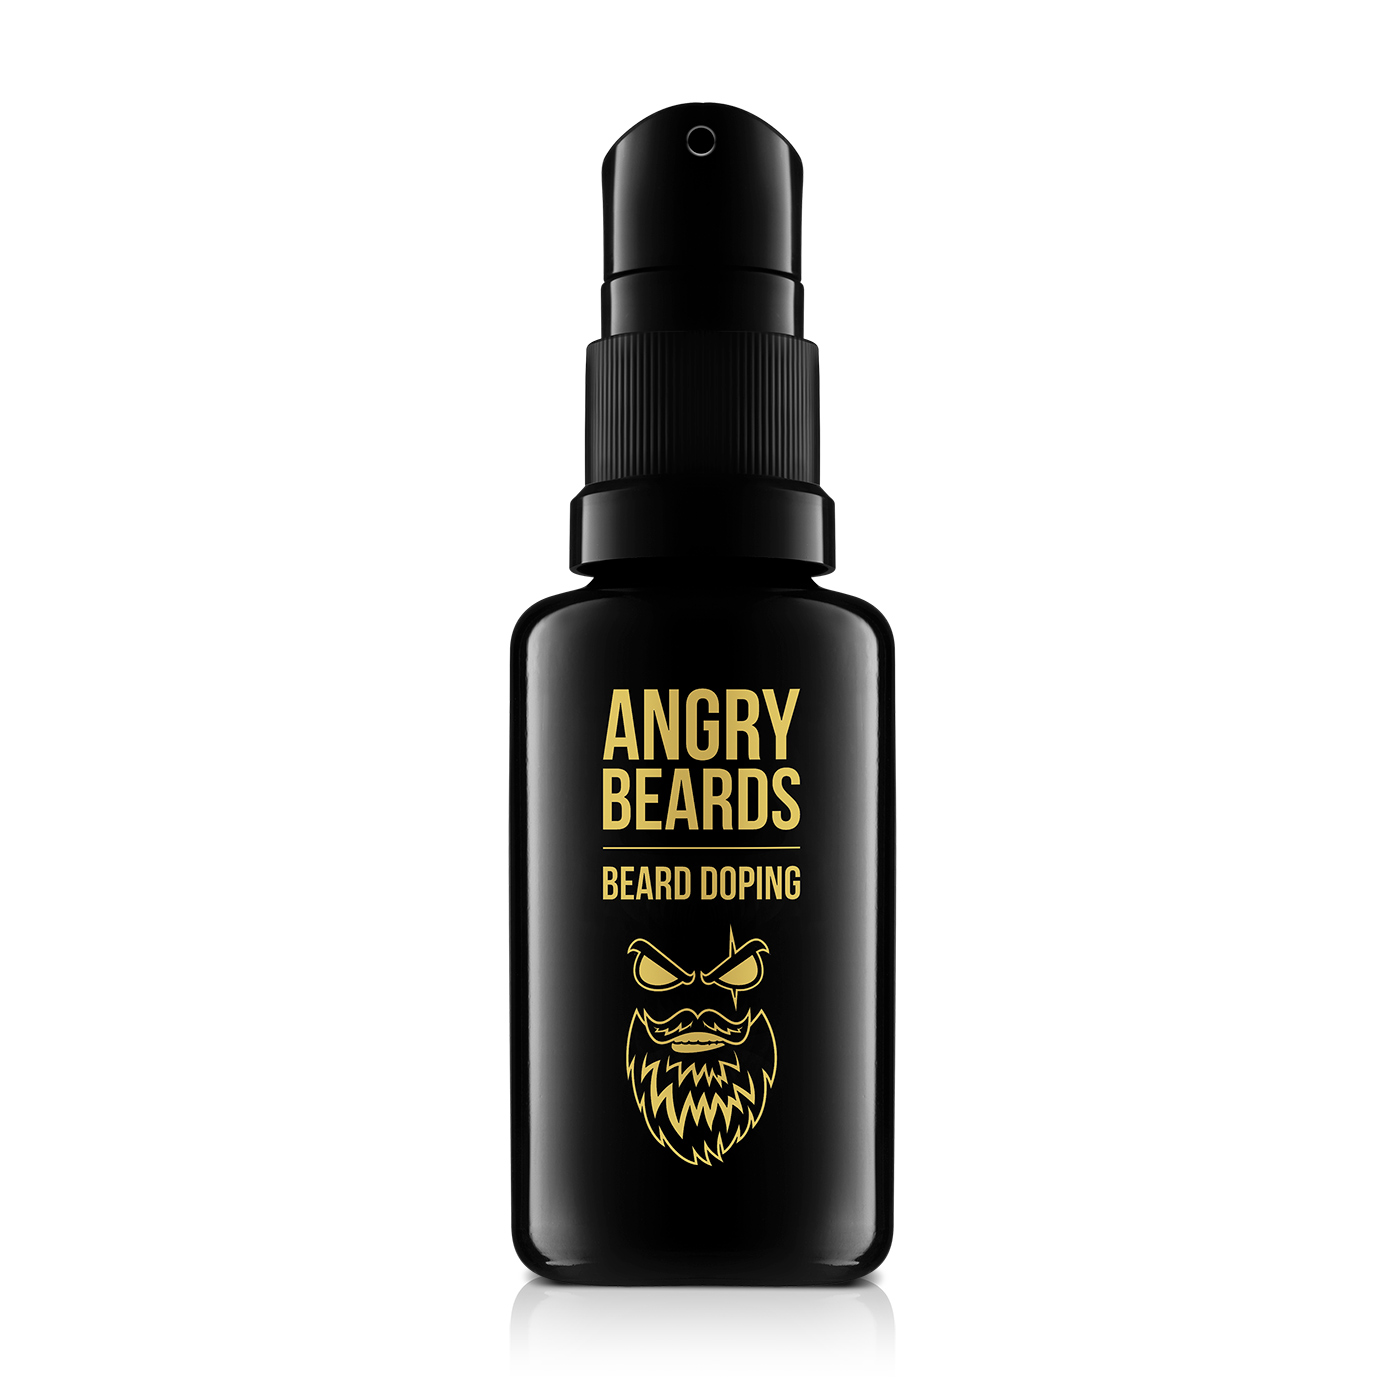 angry_beards-doping-photo01